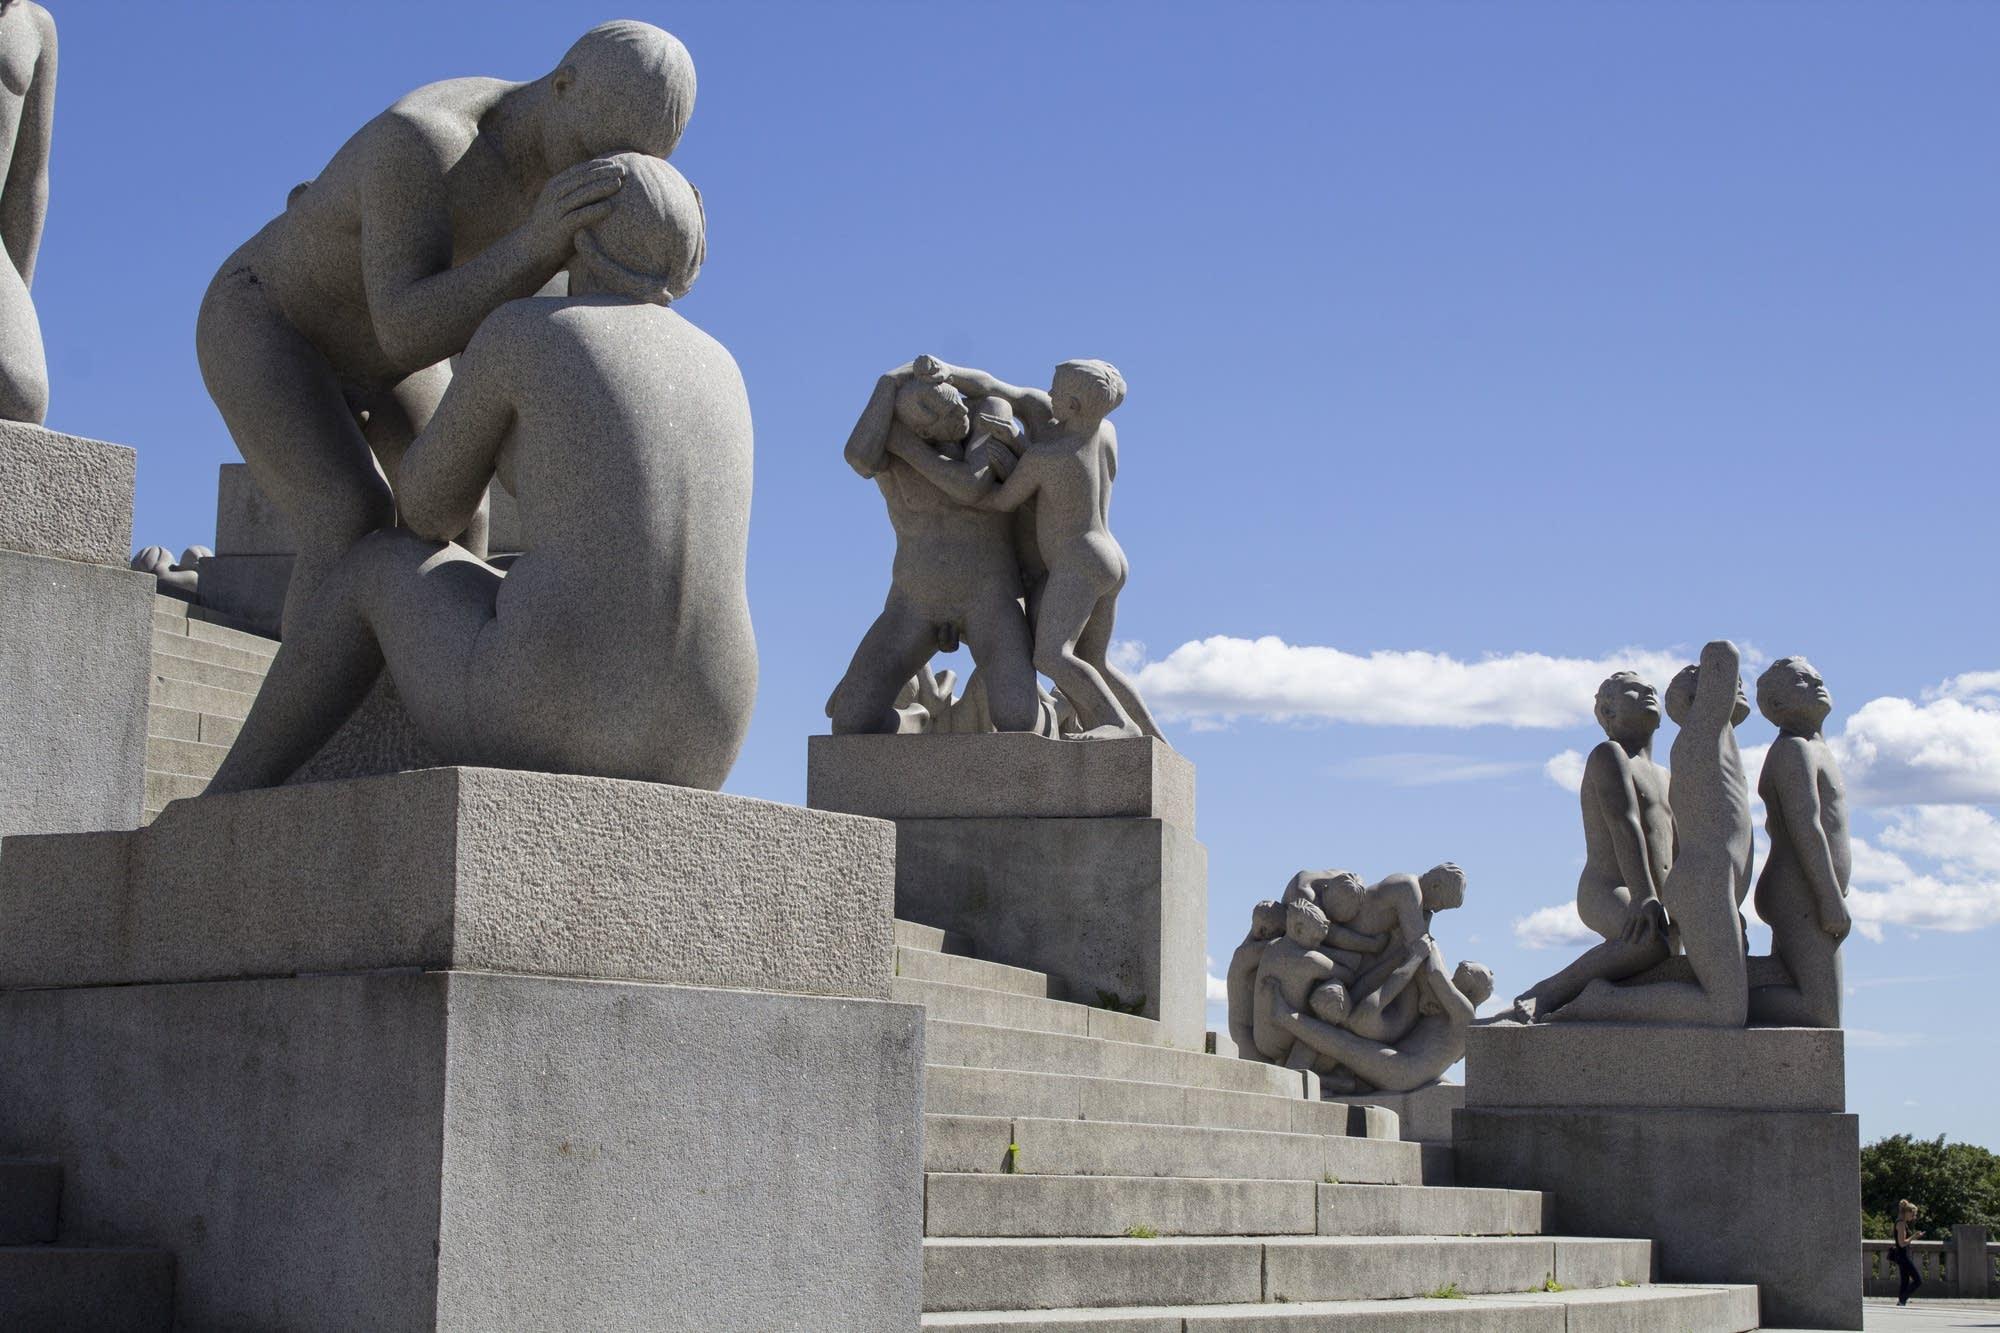 Oslo - 14 - sculpture park 2